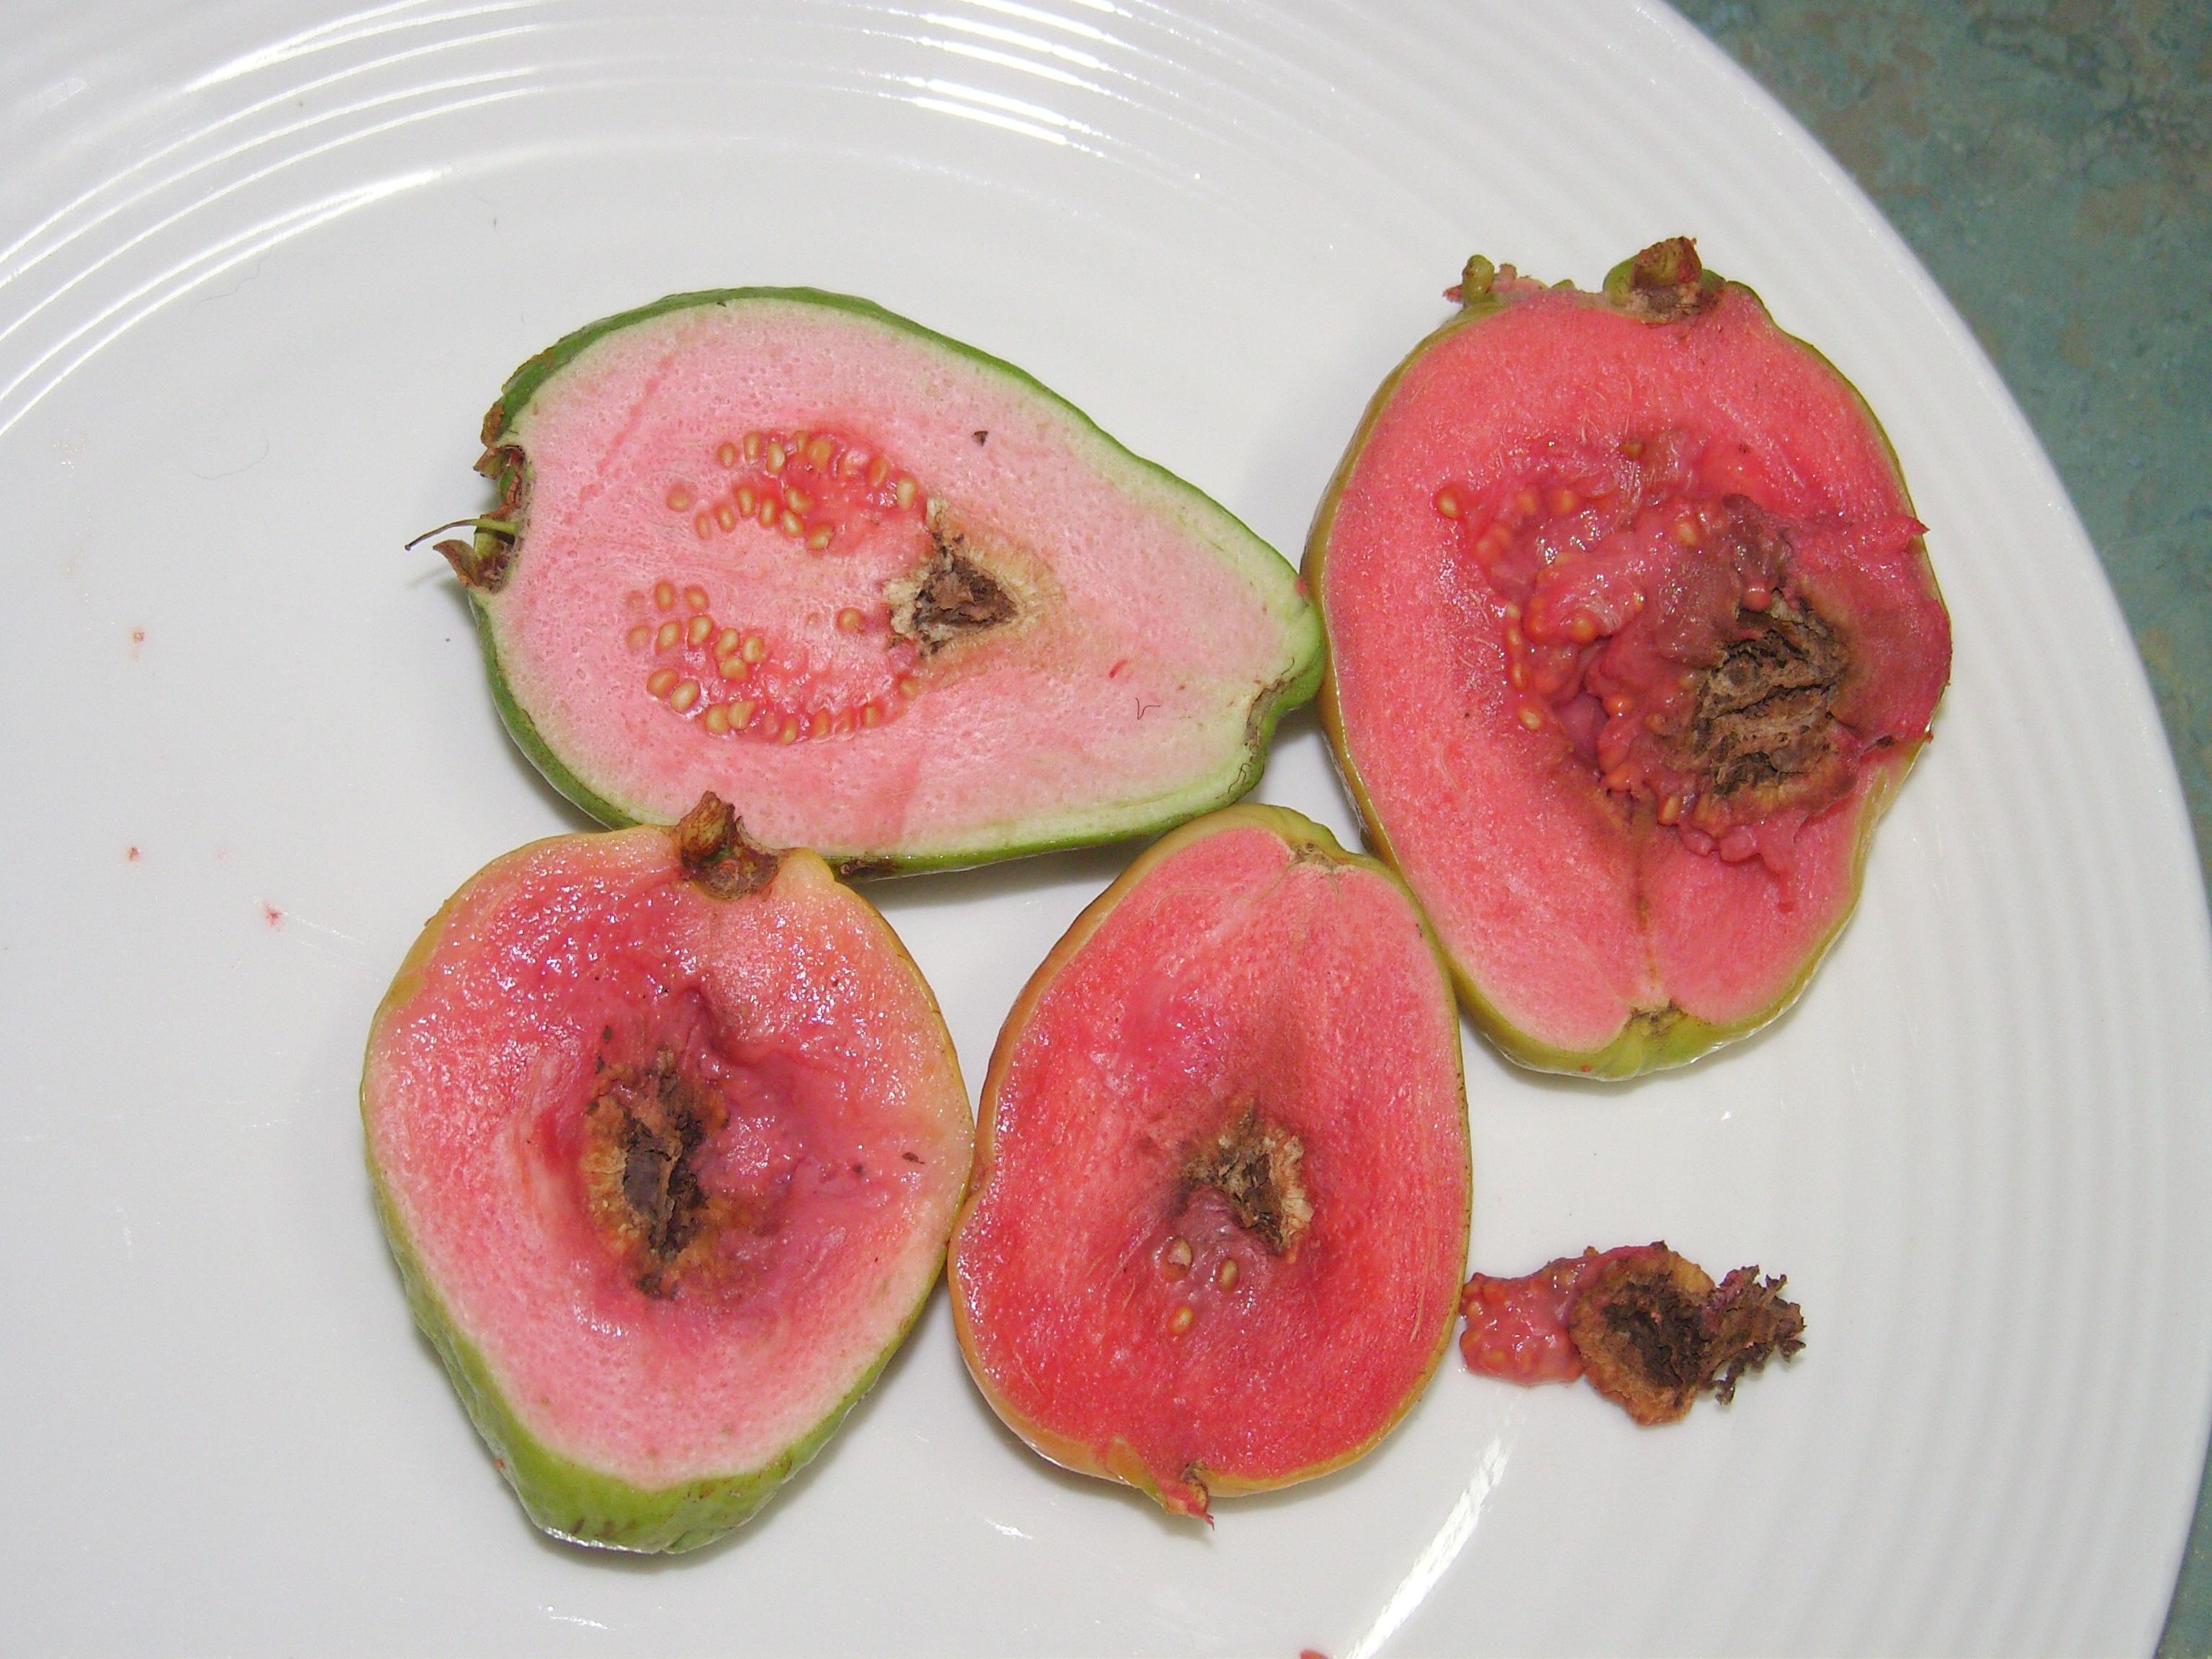 guava halves with problem